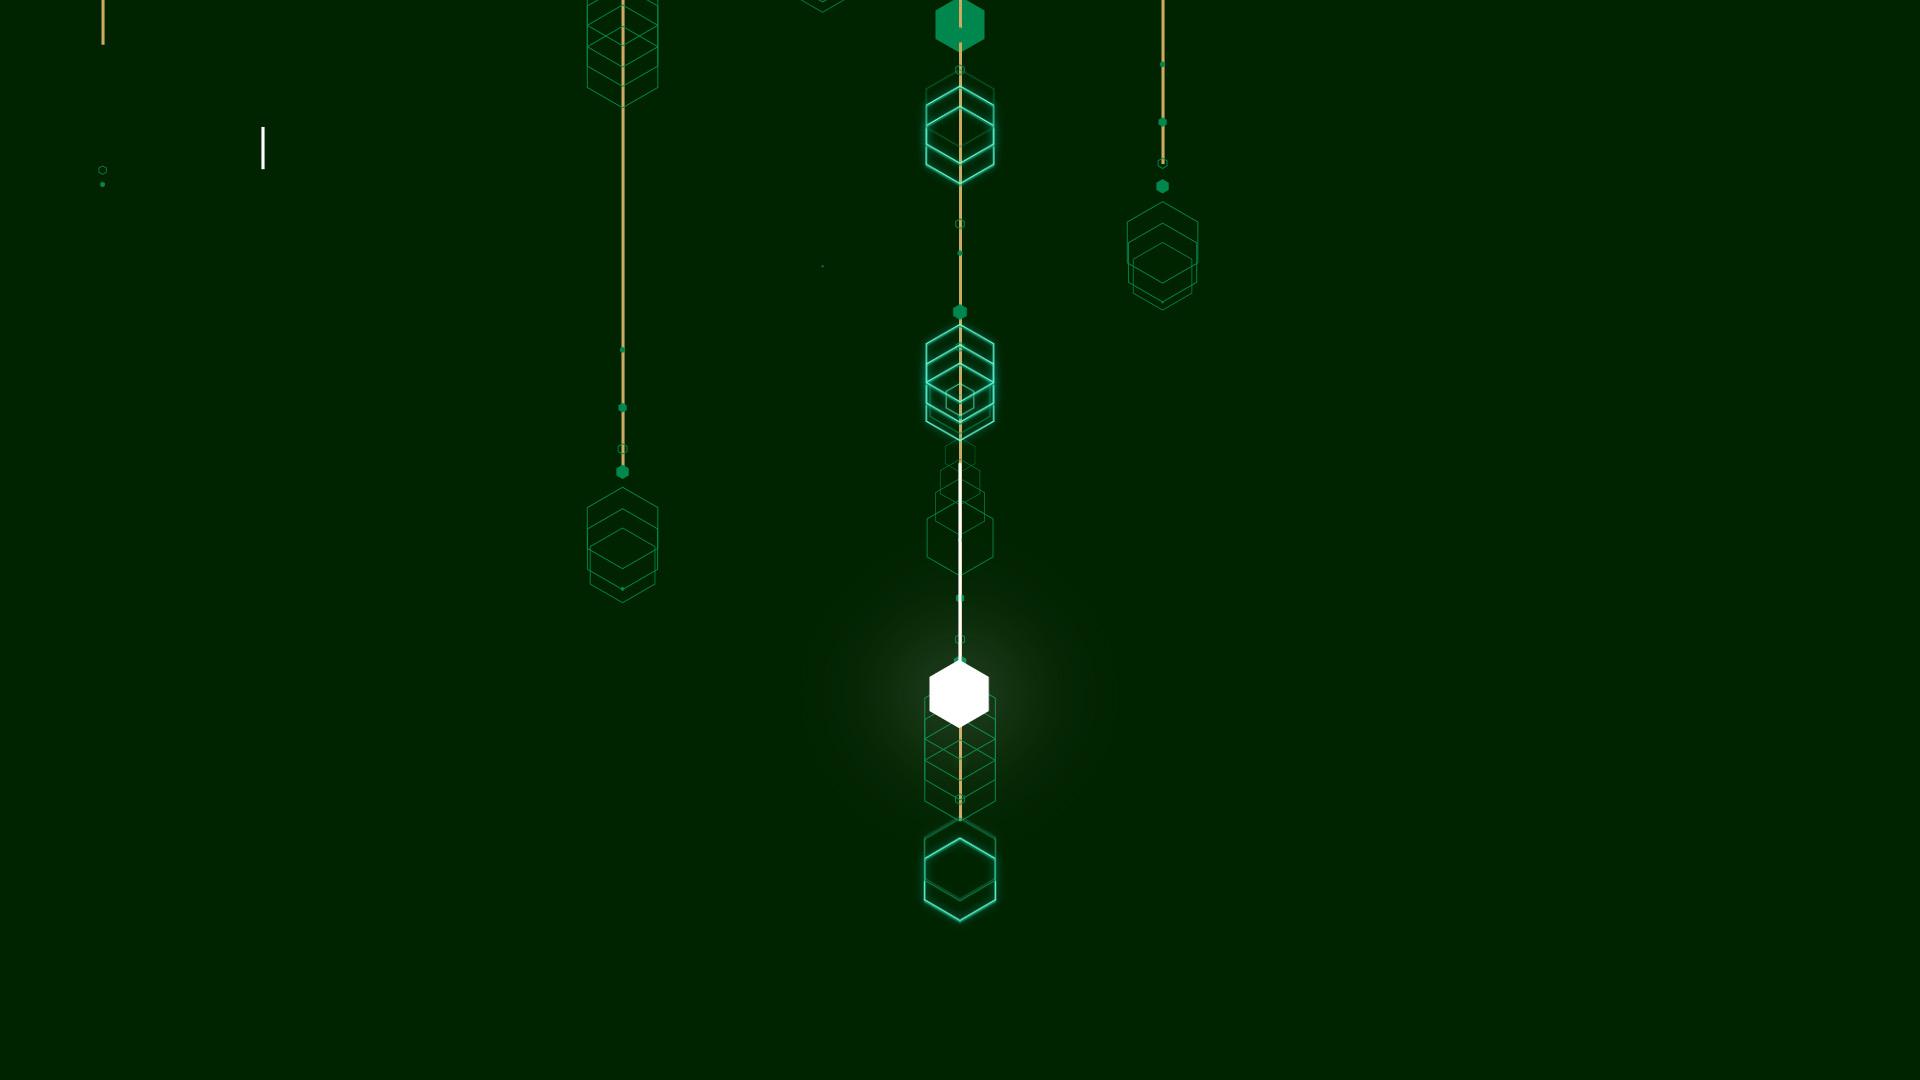 Desjardins_German_Moreno_Motion_Designer_Art_Director_Montreal_2